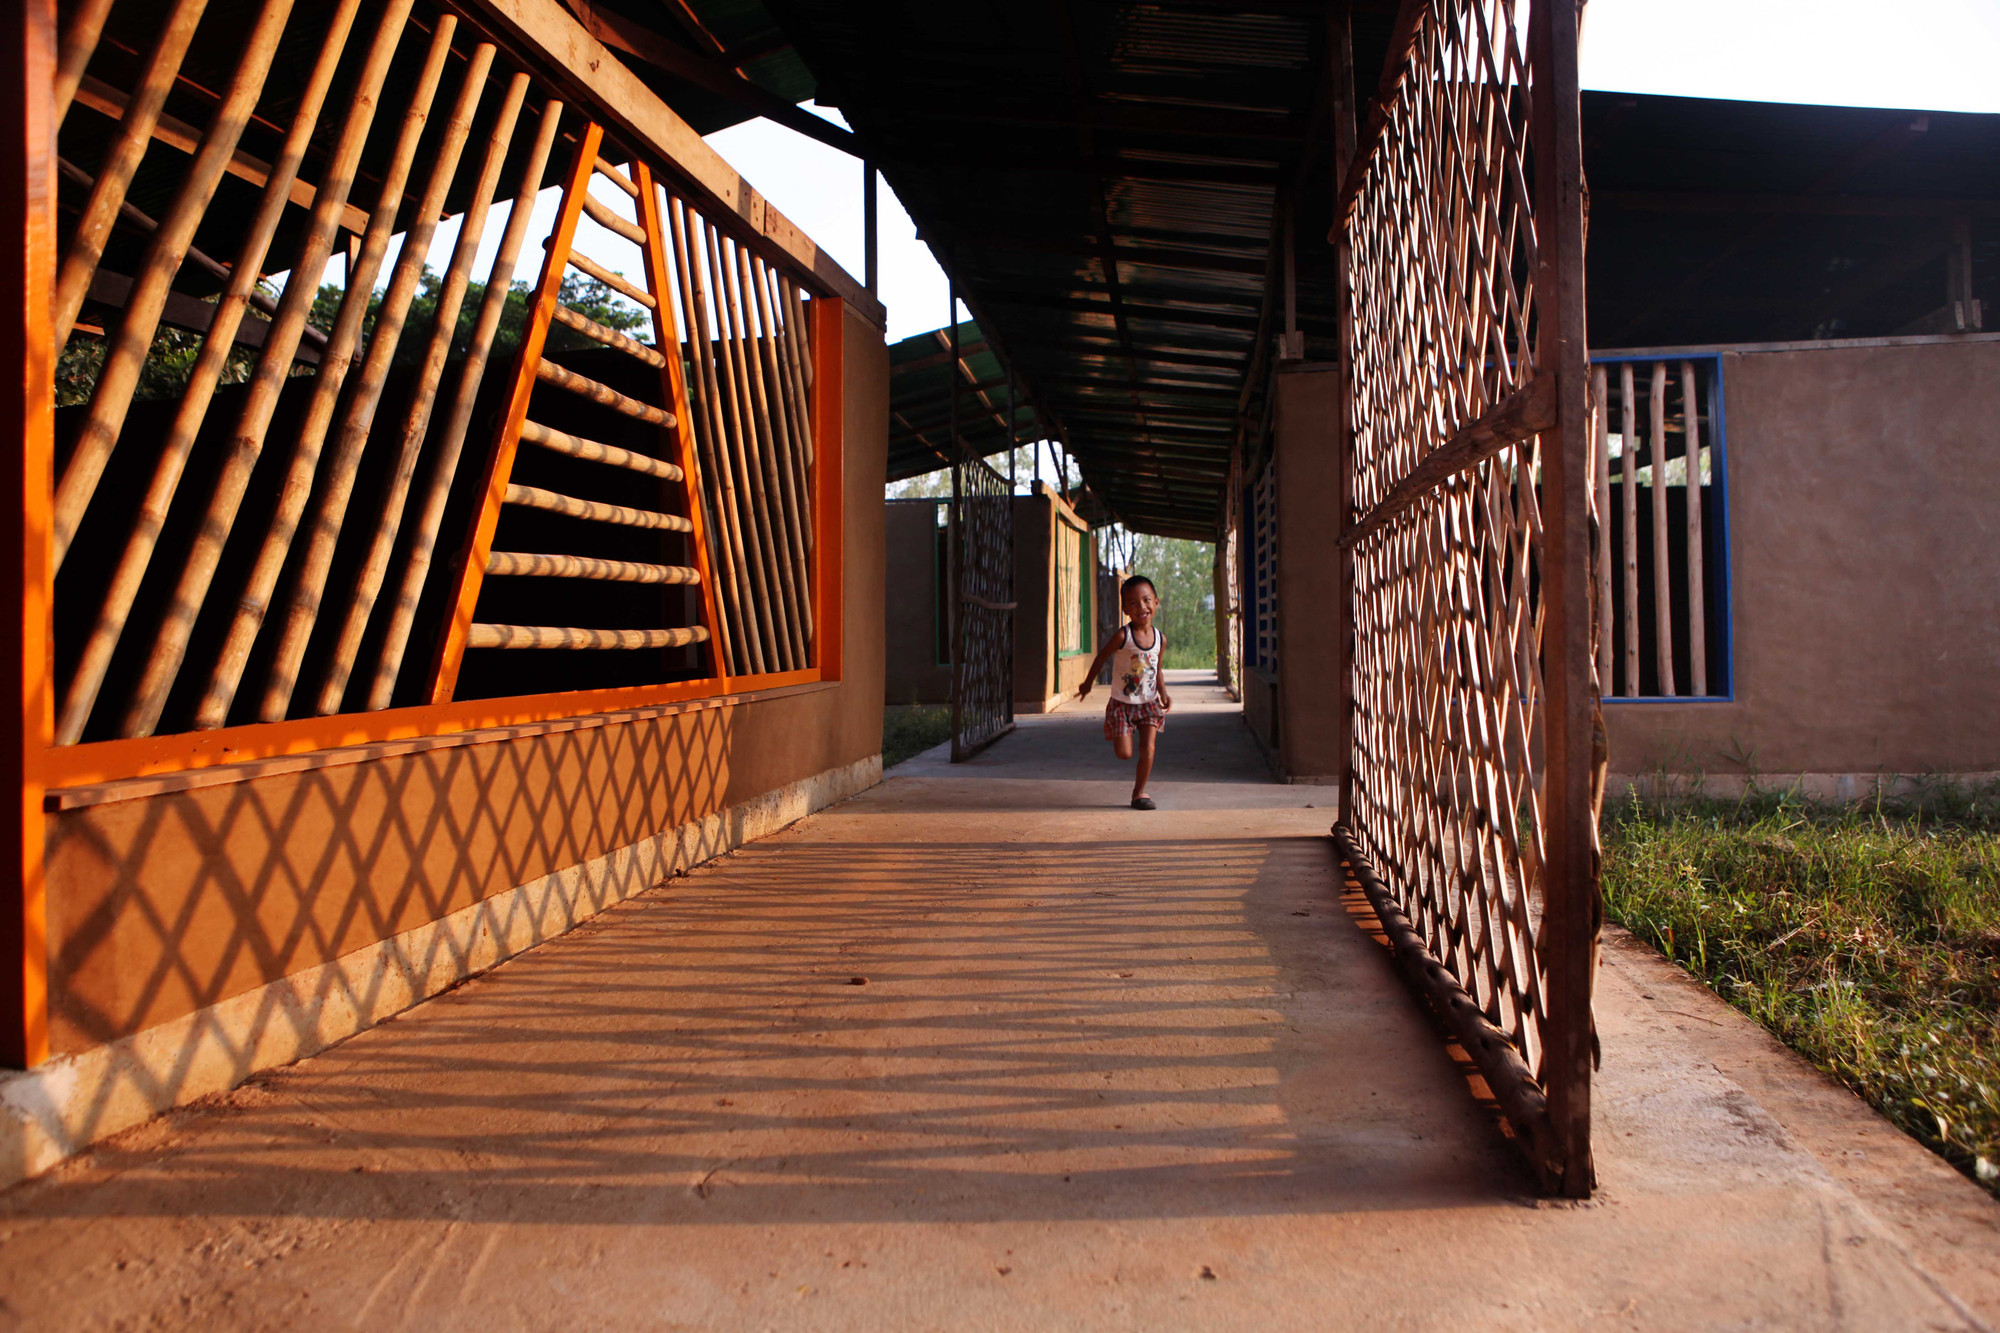 Kwel Ka Baung School / a.gor.a Architects, Courtesy of Agora Architects